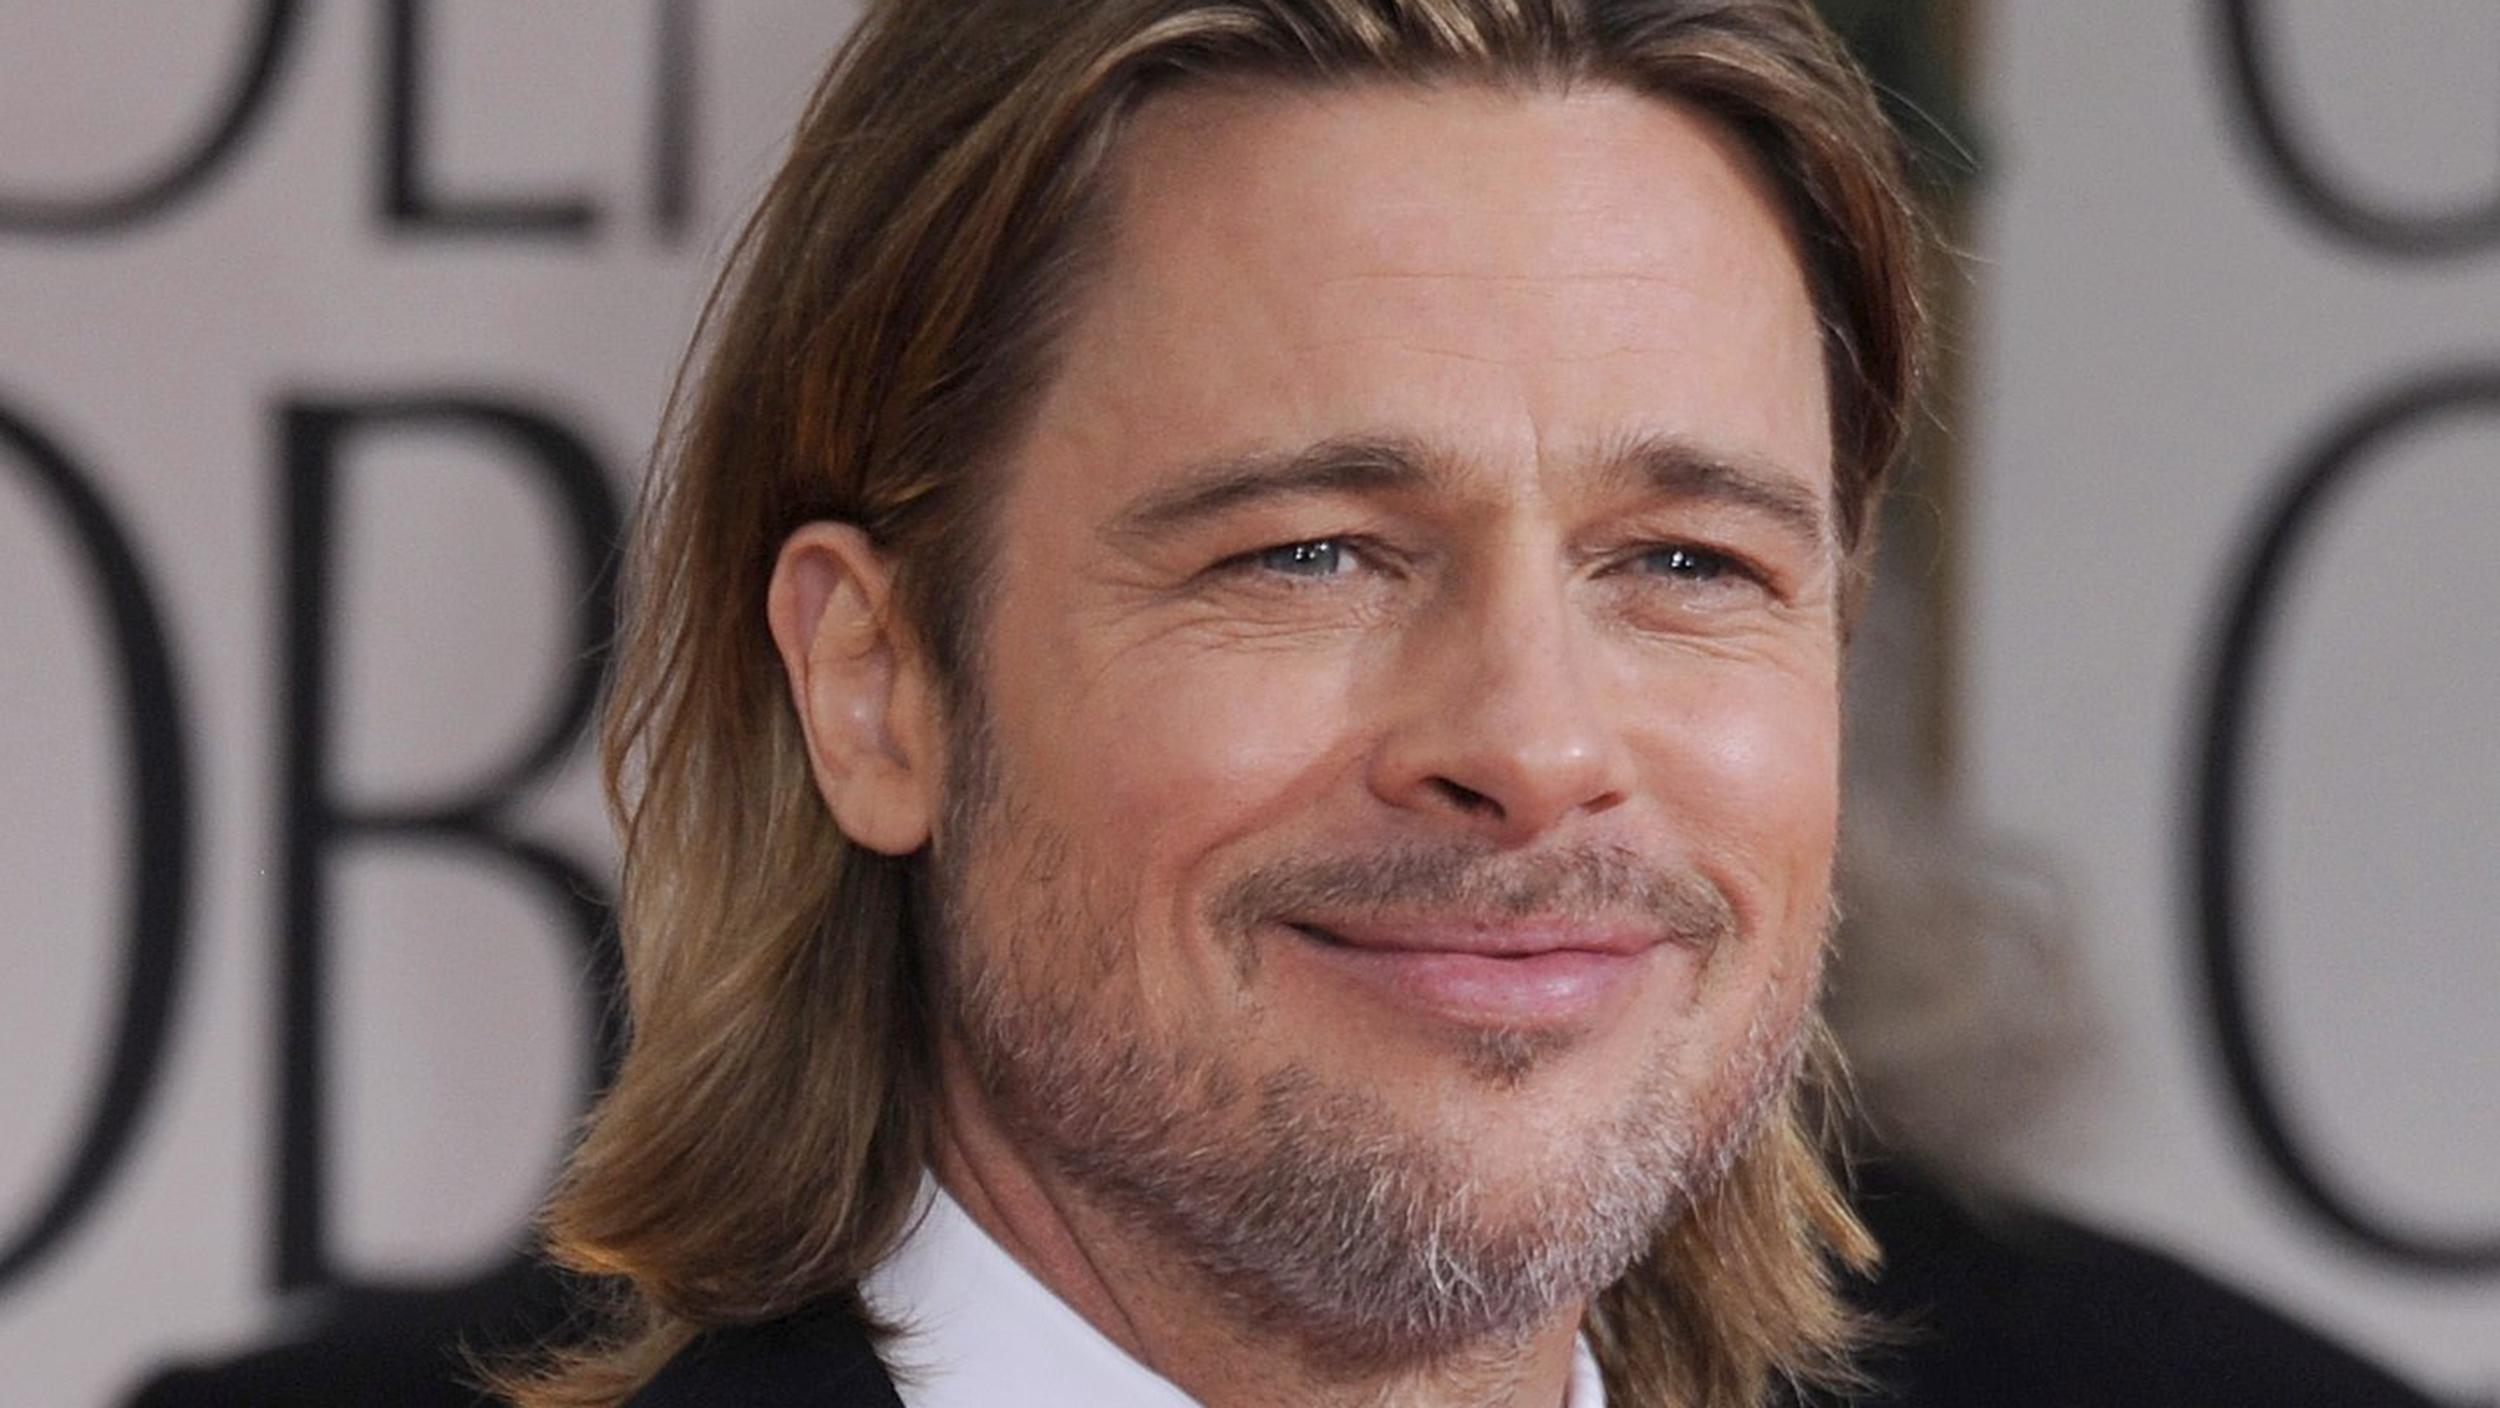 Beard Envy Hipster Trend Sparks Interest In Facial Hair